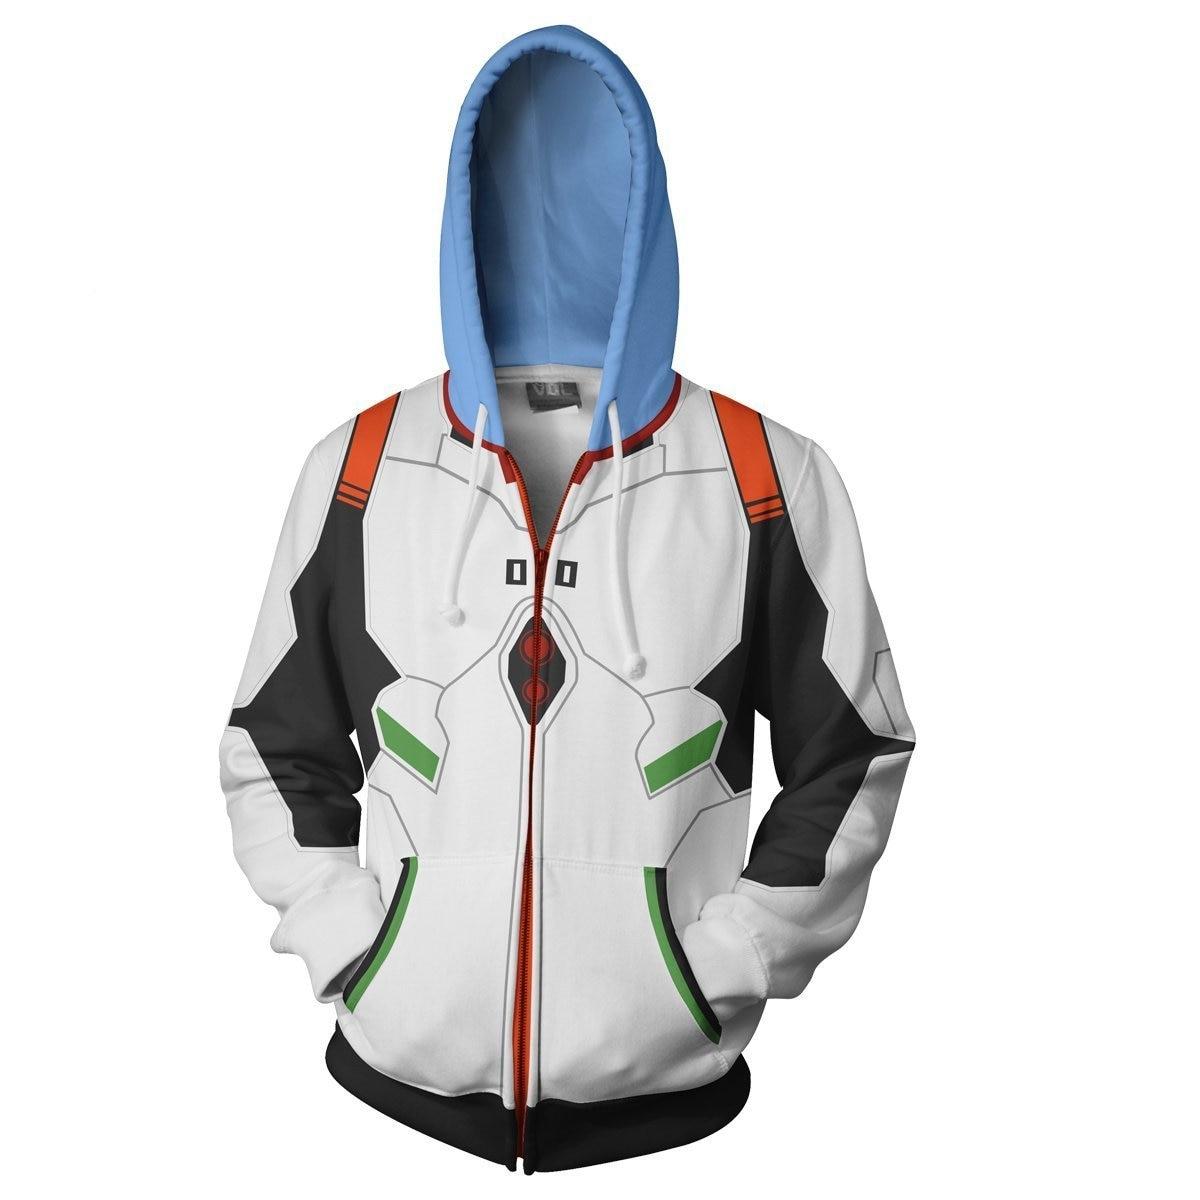 HTB1Fga.XgaH3KVjSZFjq6AFWpXaR Jaqueta evangelion ayanami rei sweatshirts com capuz cosplay traje jaquetas homens casaco superior com zíper casual hoded